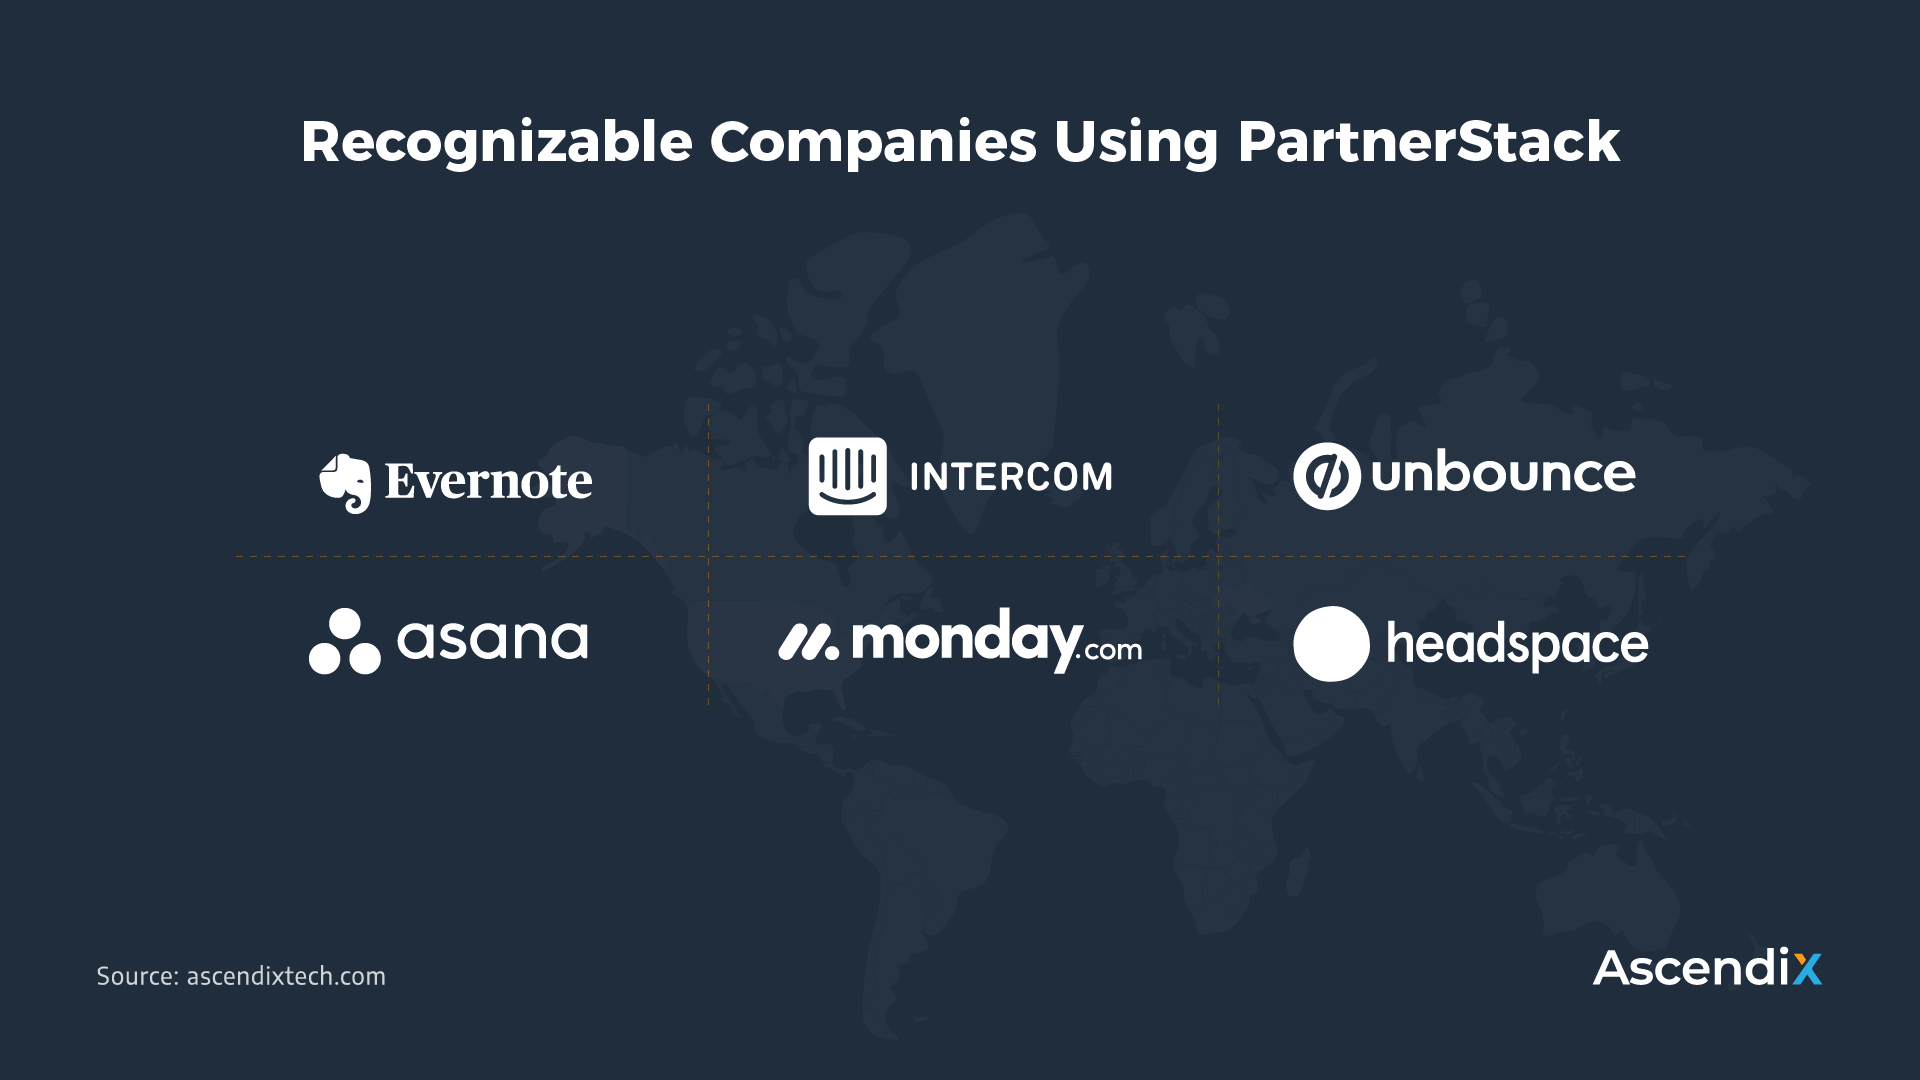 Recognizable Companies Using PartnerStack